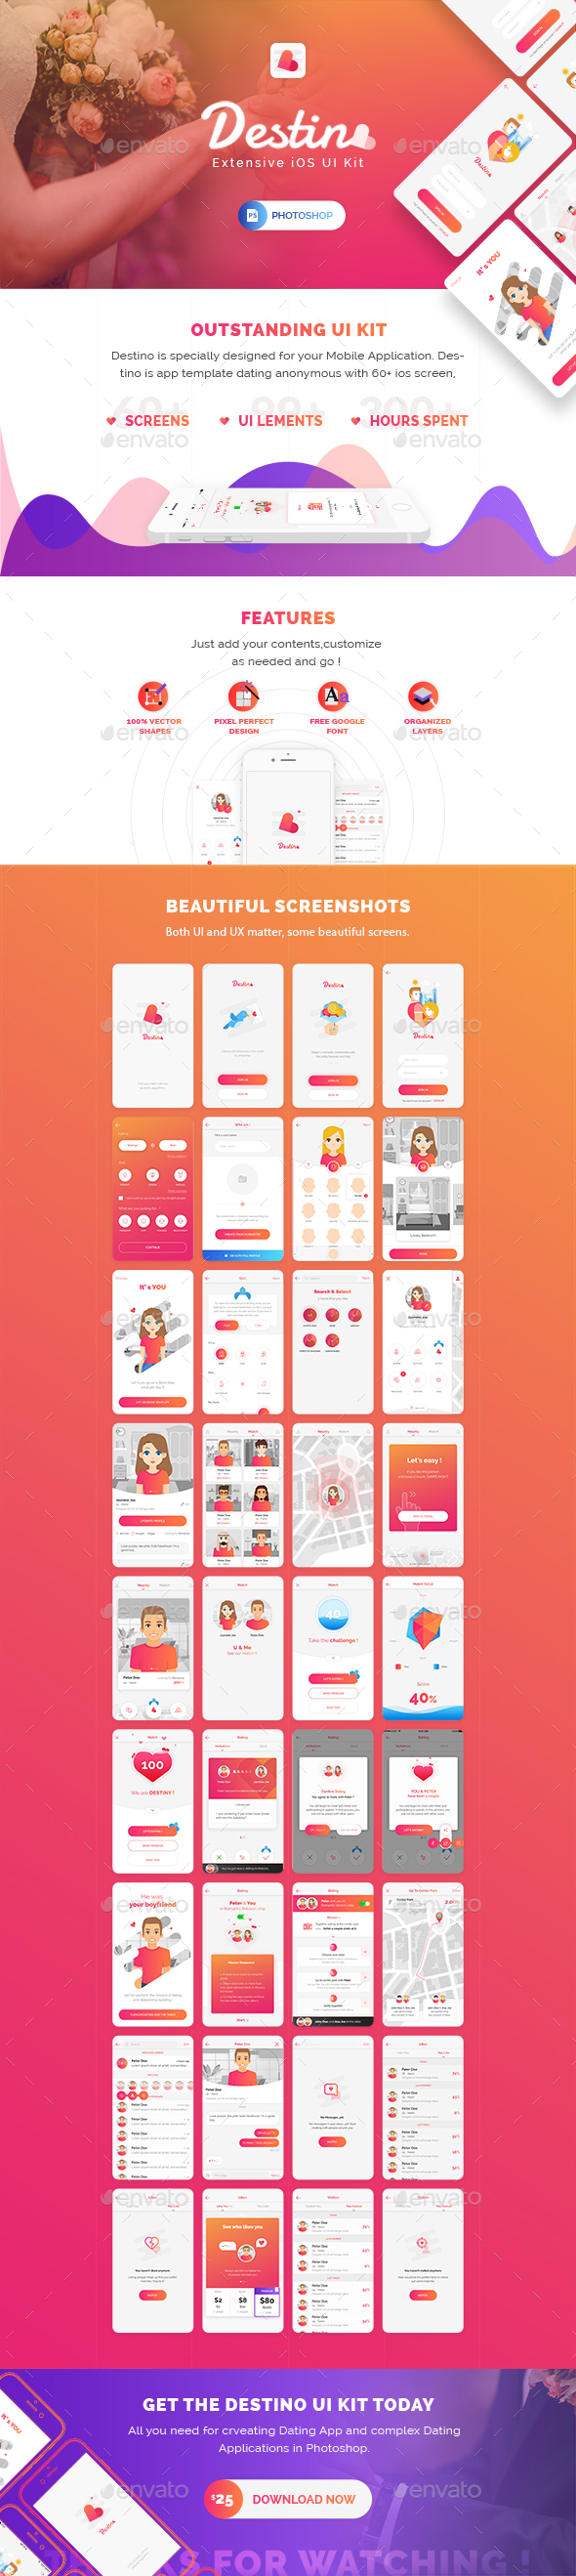 Destino App Ui Kit - User Interfaces Web Elements  Design  Ui Kit, App Ui, App Design-9896